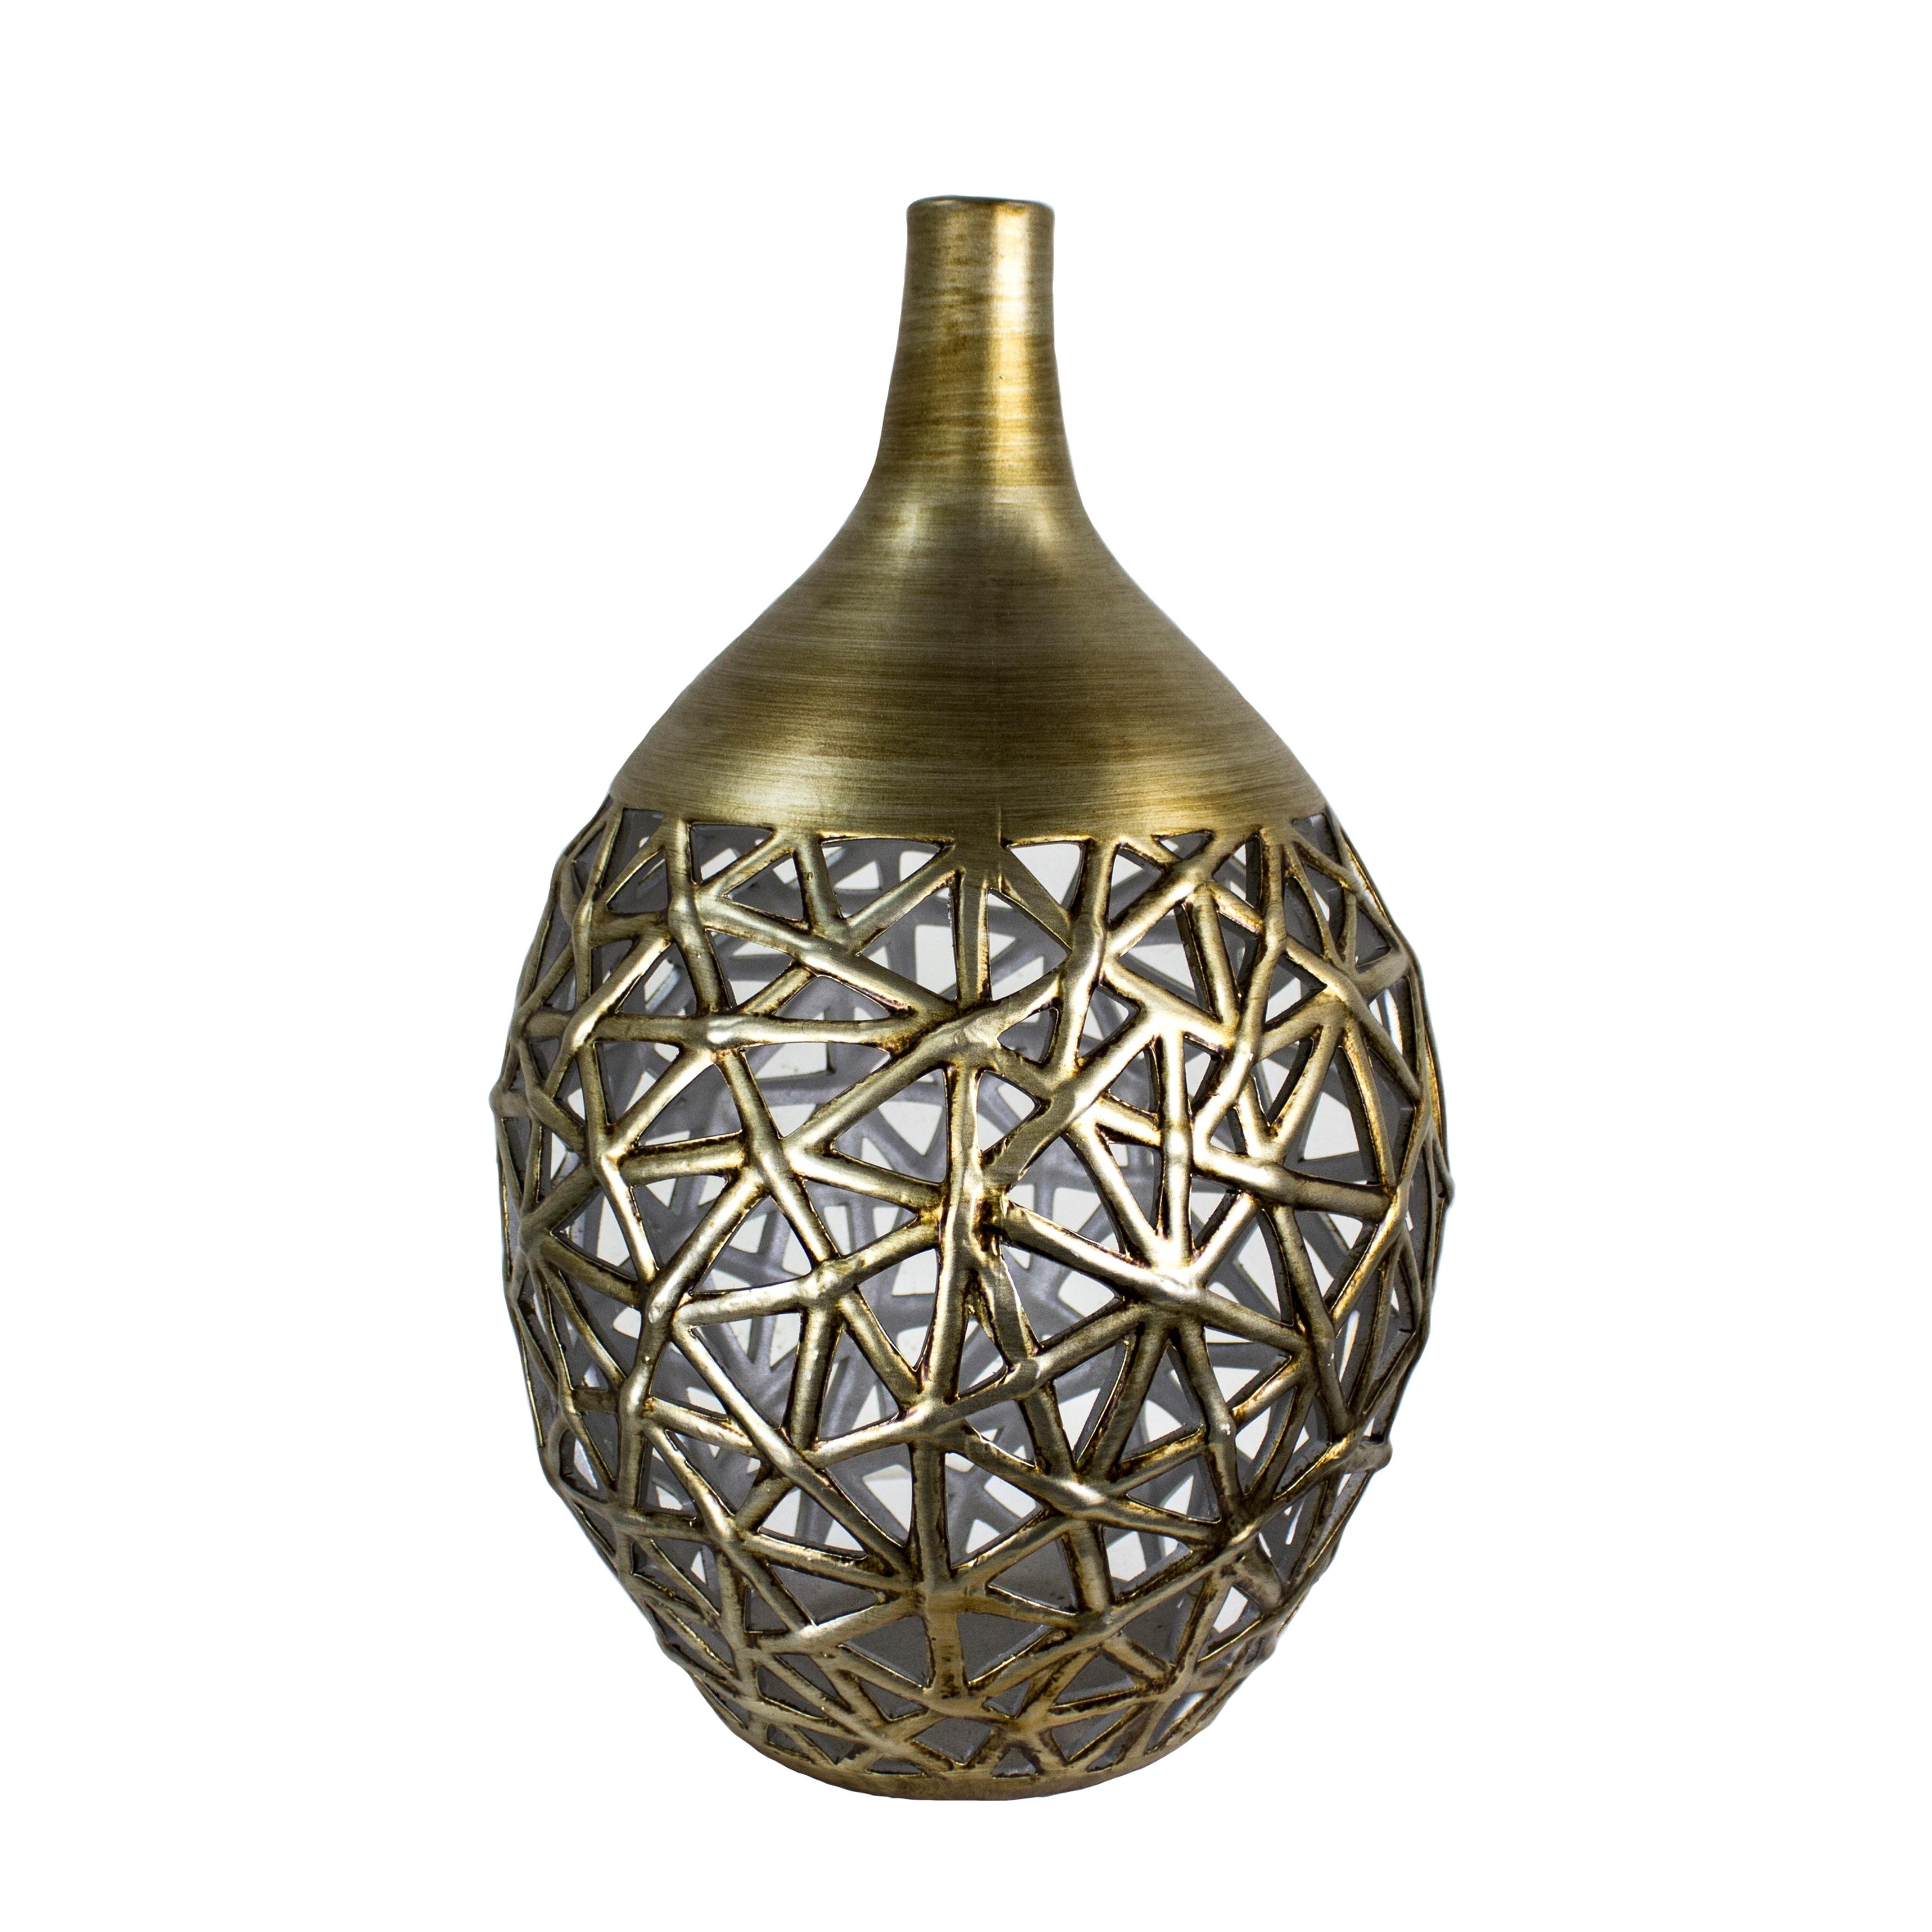 Decorative Cutout Pattern Ceramic Vase with Elongated Narrow Neck, Gold